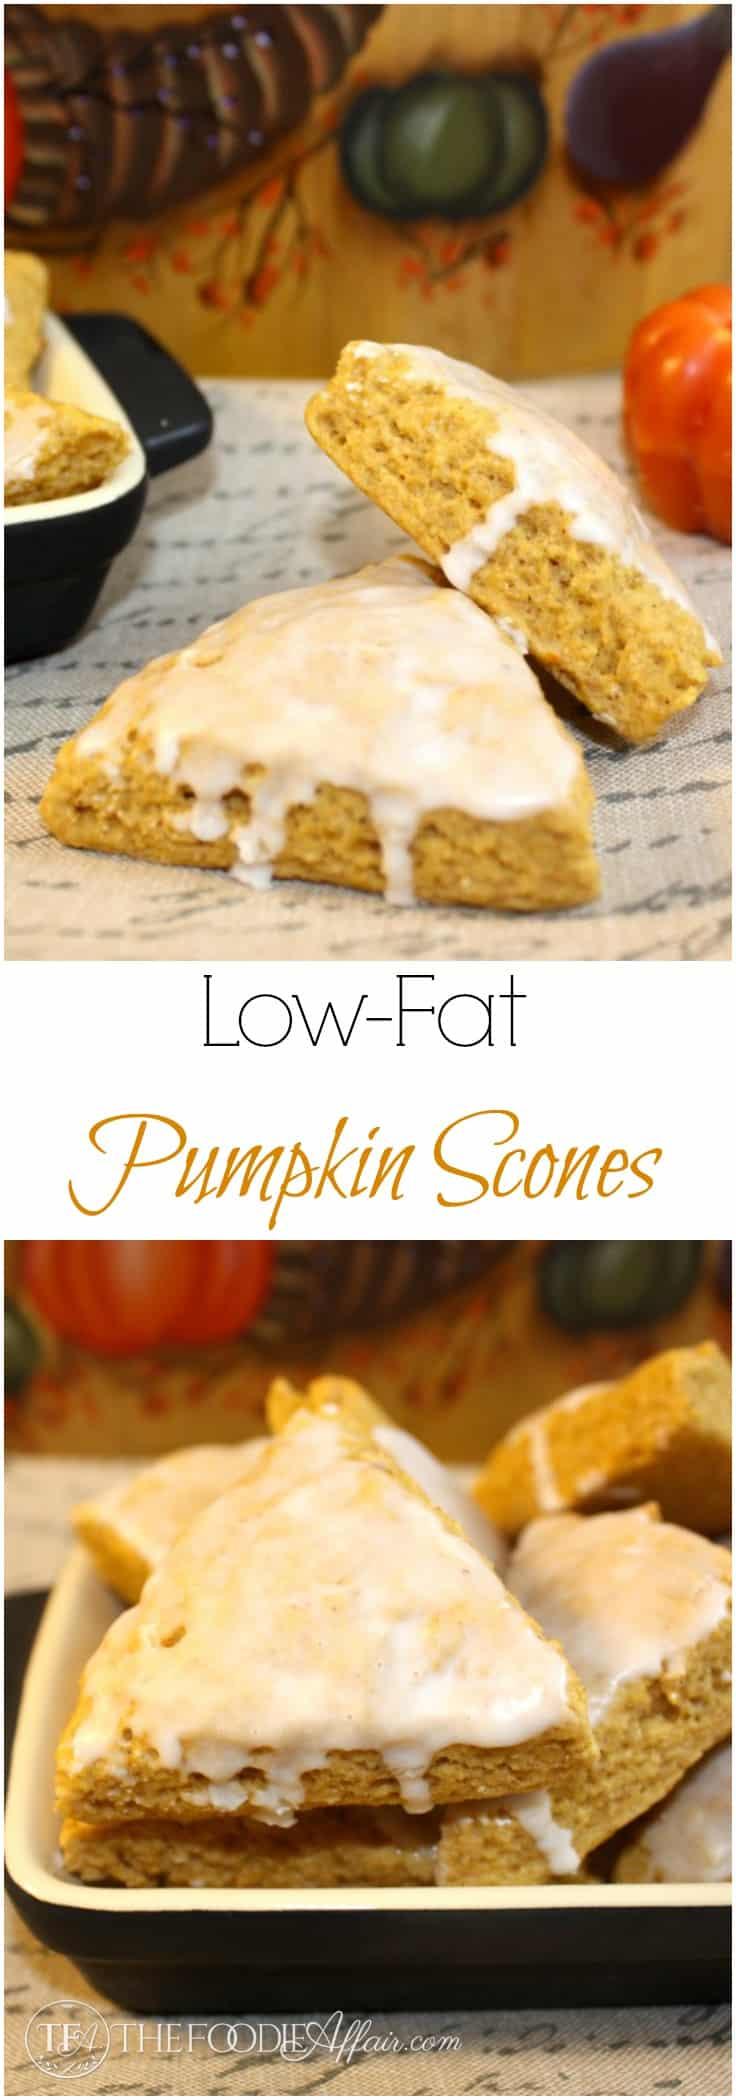 Low Fat Pumpkin Scones 116